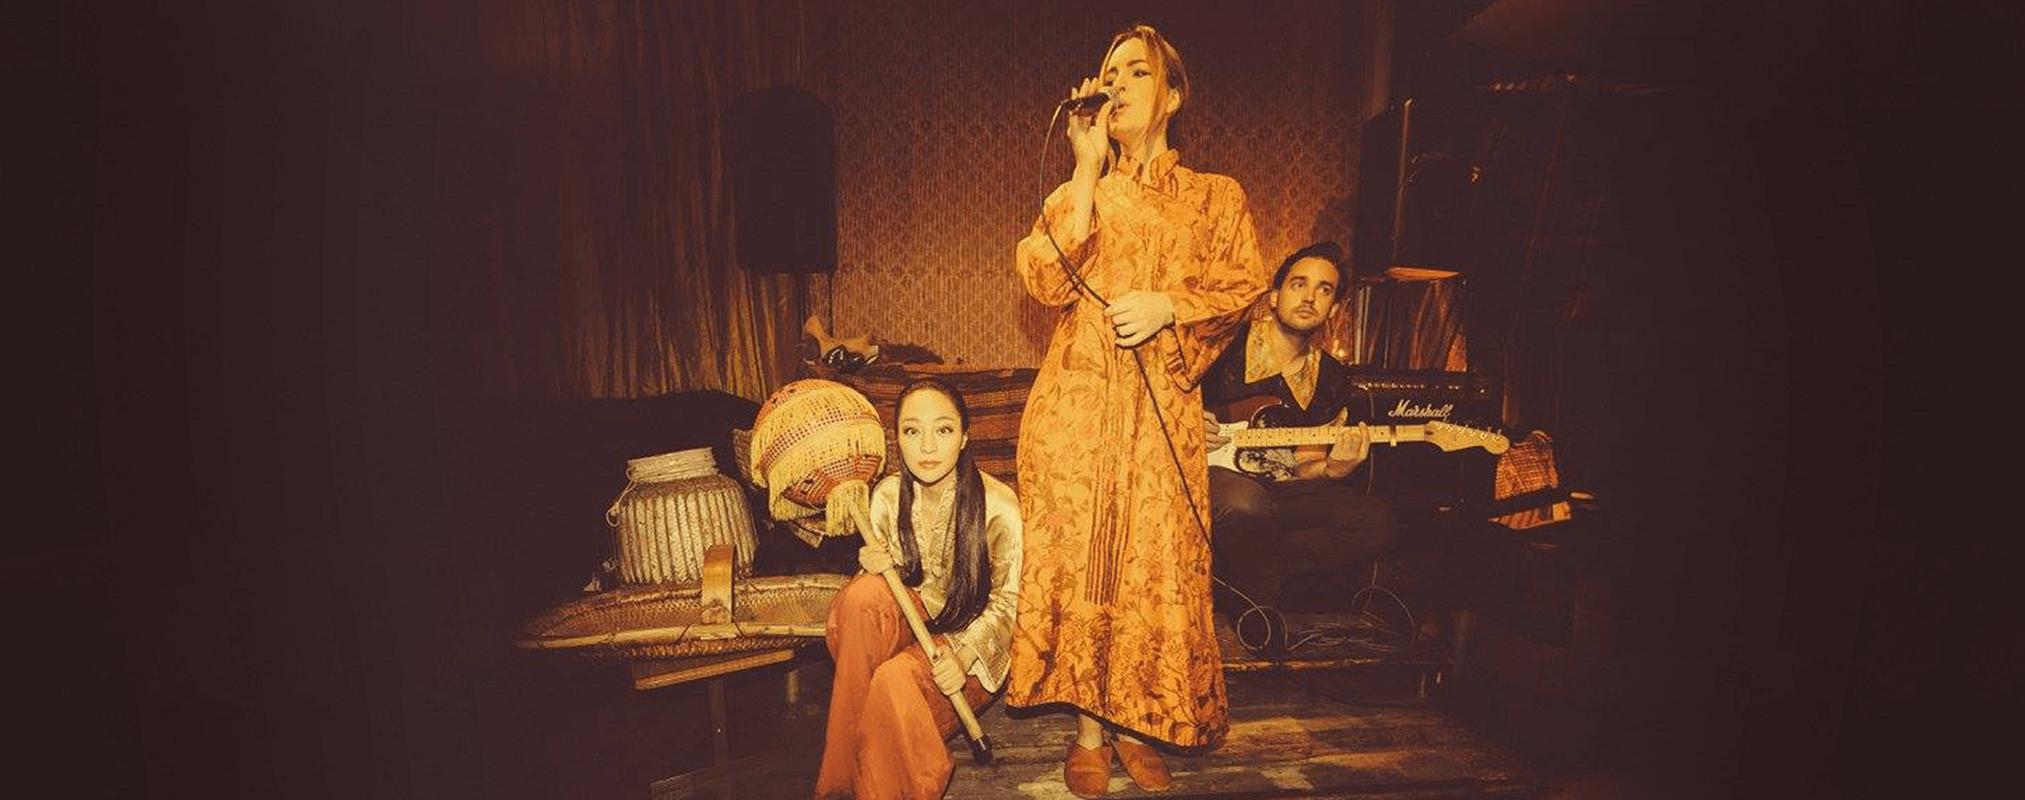 performance-artist-south-west-london-female-lgbtq-singer-duo-trio-vocalist-guitarist-corporate-events-parites-stephanie-jane-oliver-opium-den-small.png